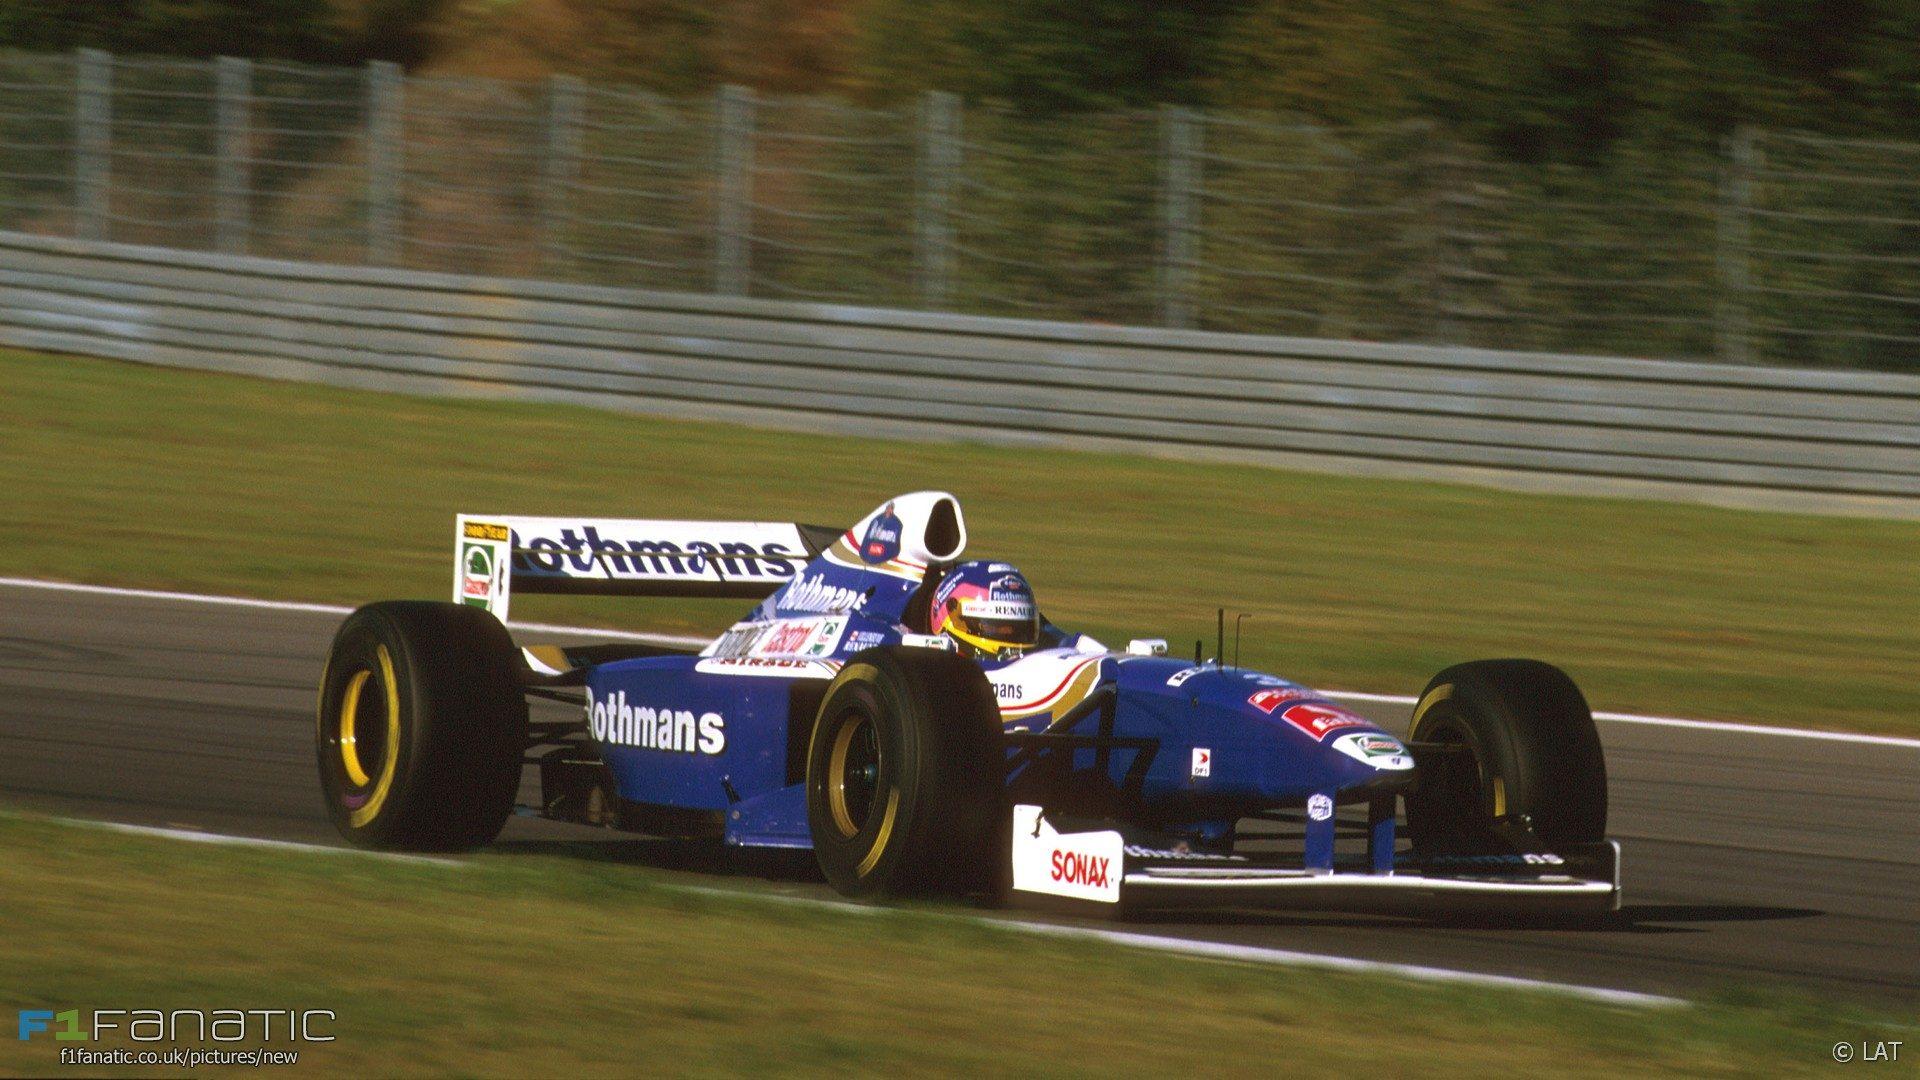 Jacques Villeneuve, Williams, Nurburgring, 1997